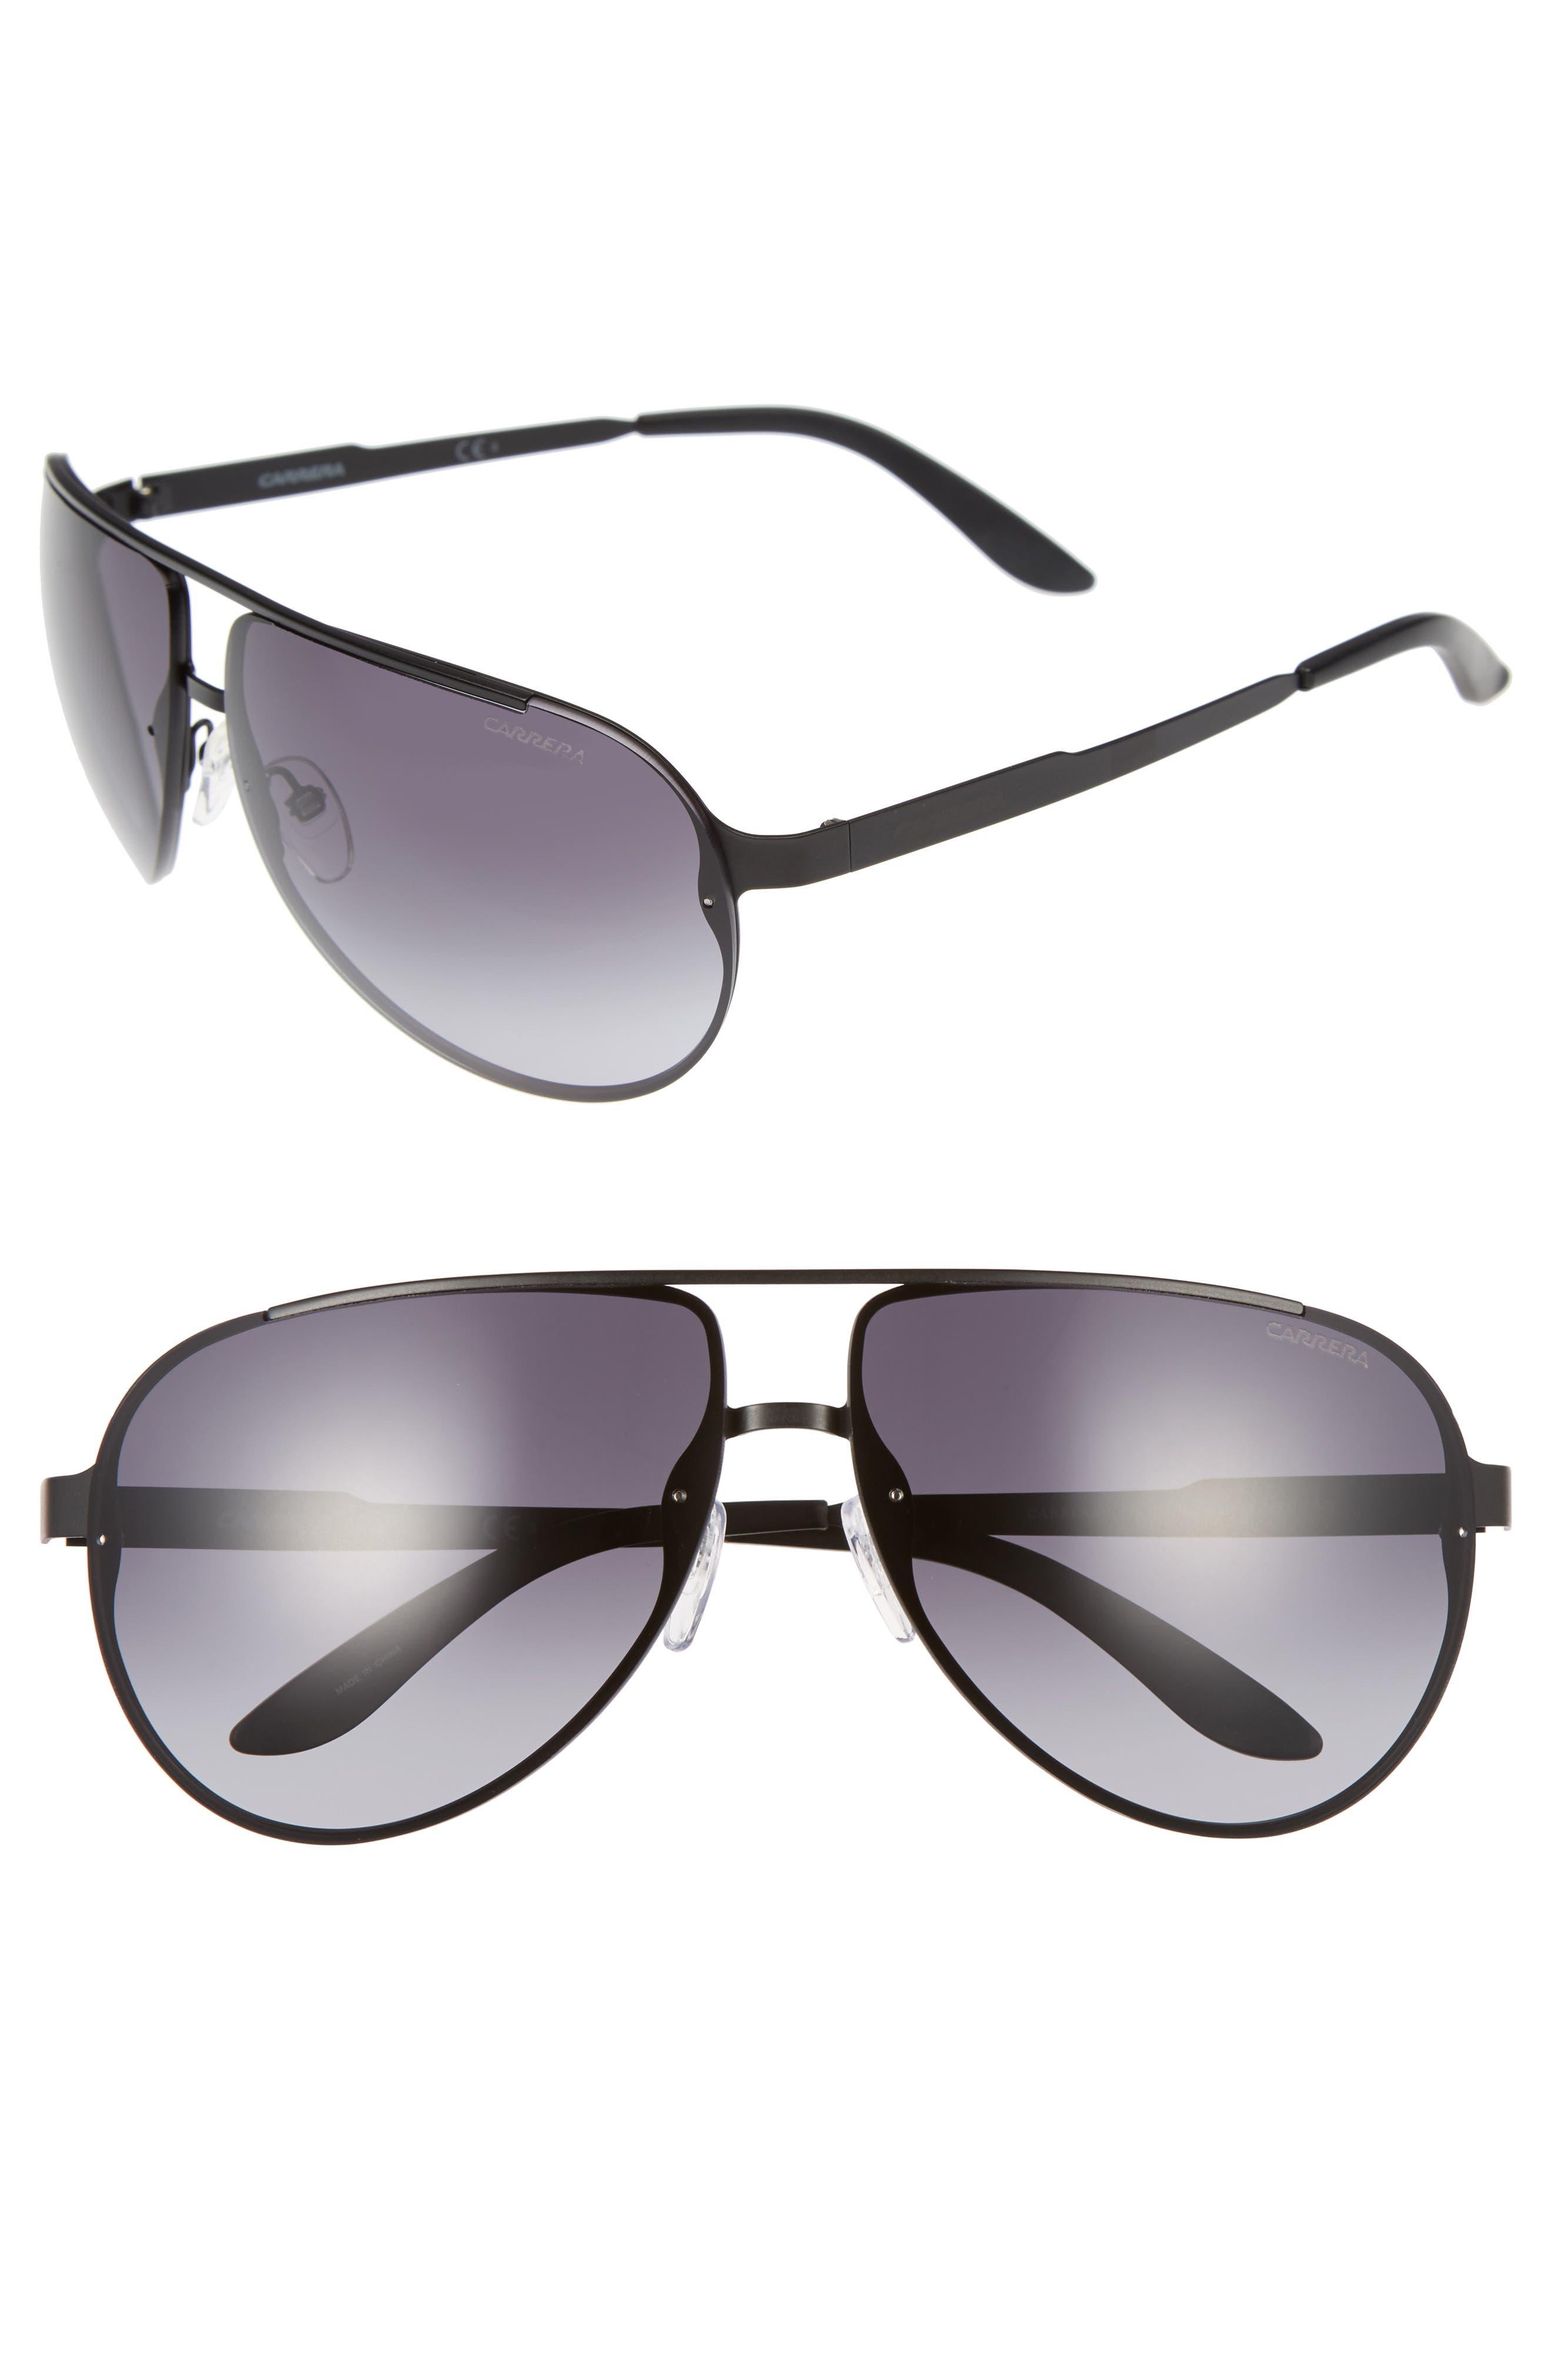 CA102 65mm Aviator Sunglasses,                             Alternate thumbnail 2, color,                             001